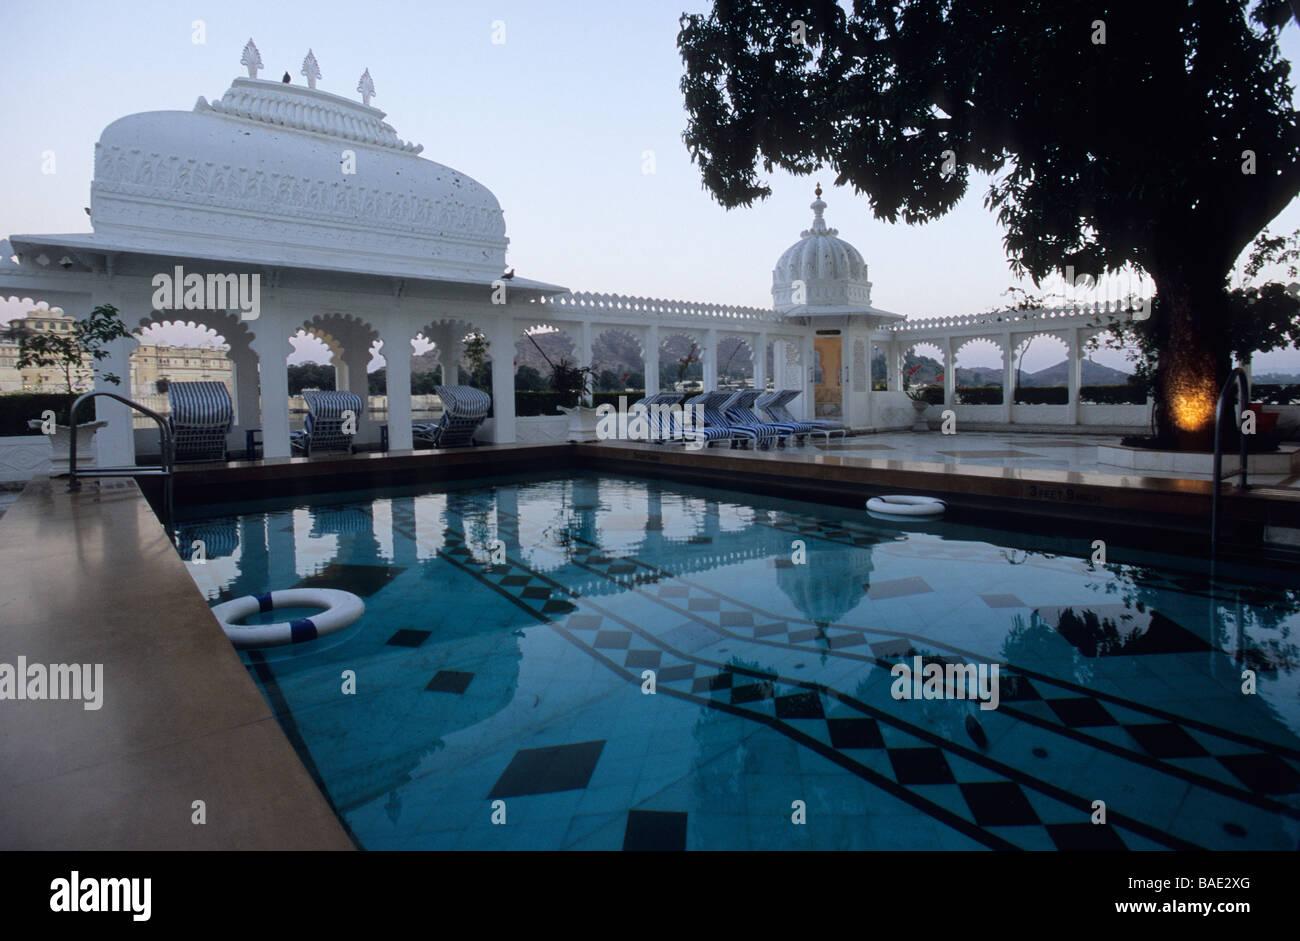 India Rajasthan State Udaipur Taj Lake Palace Hotel On Lake Stock Photo Royalty Free Image